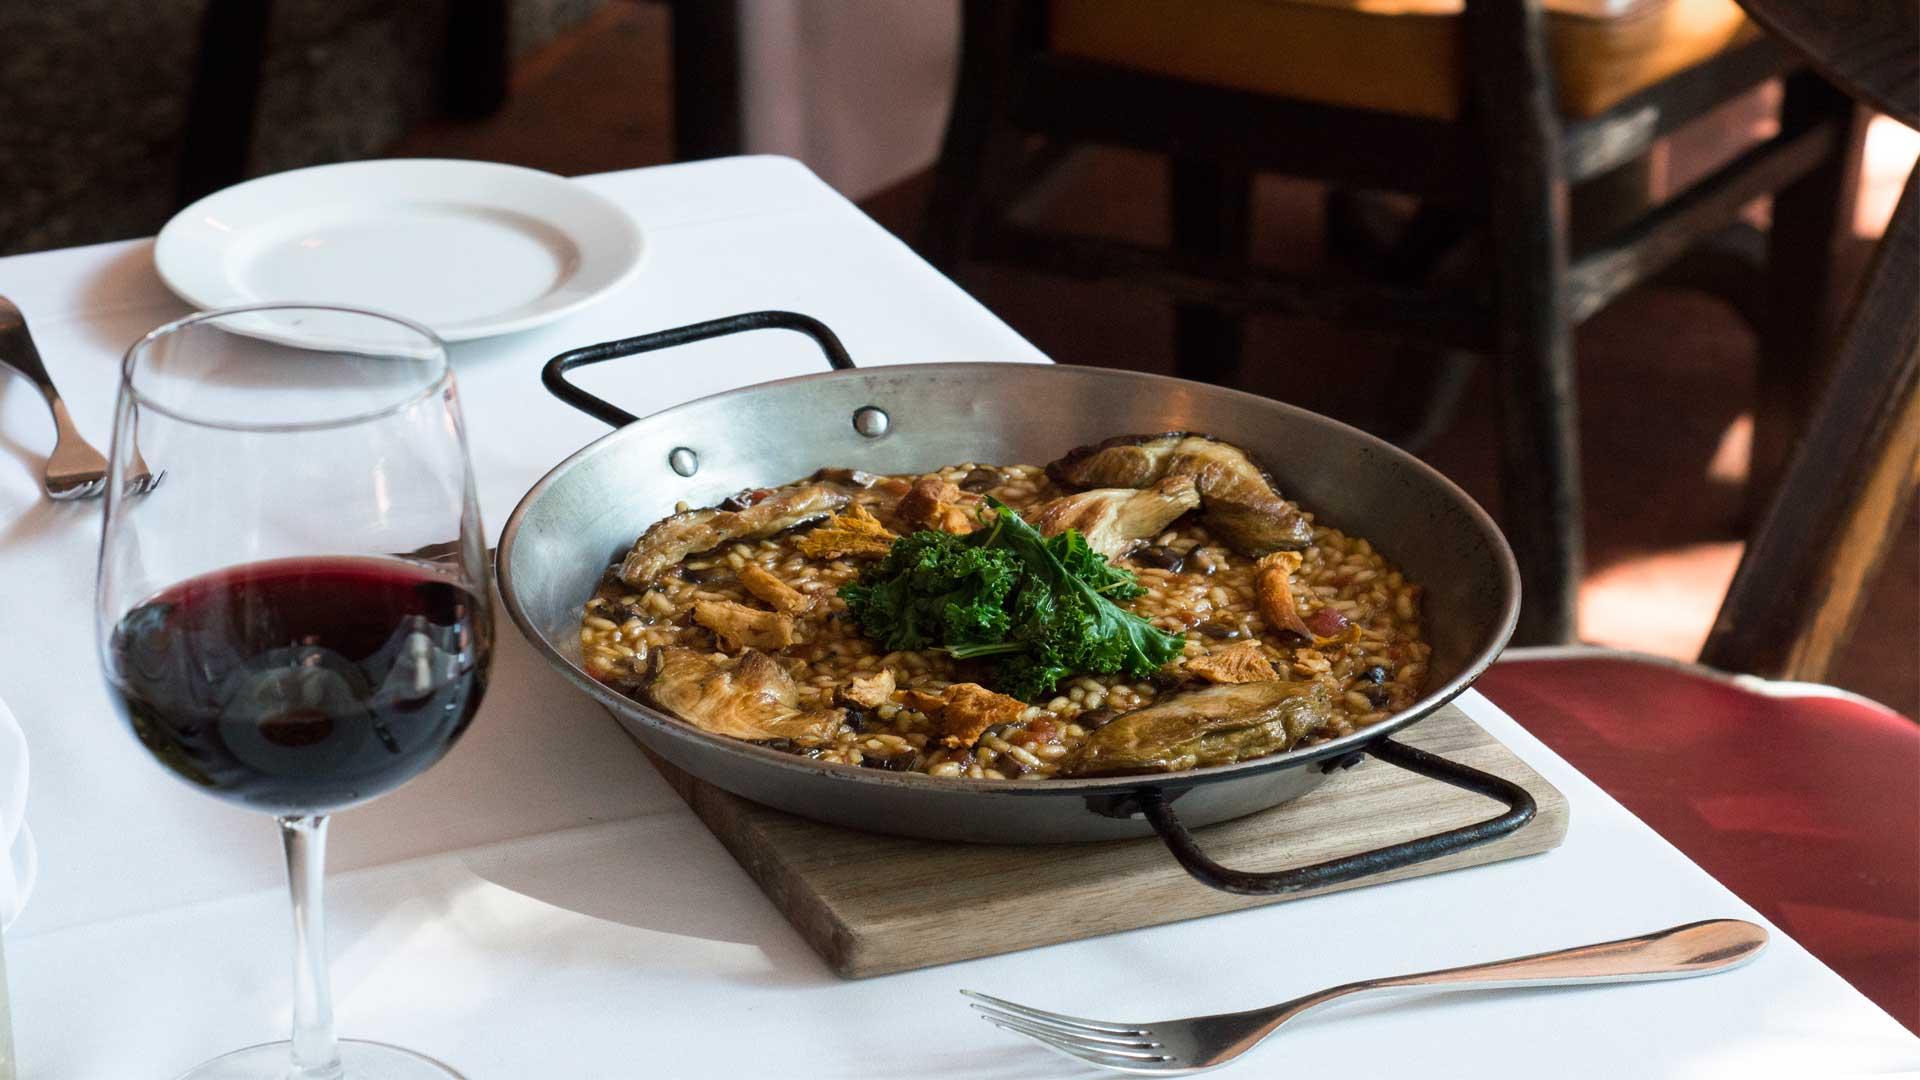 Emilio: gastronomía vasca en Polanco